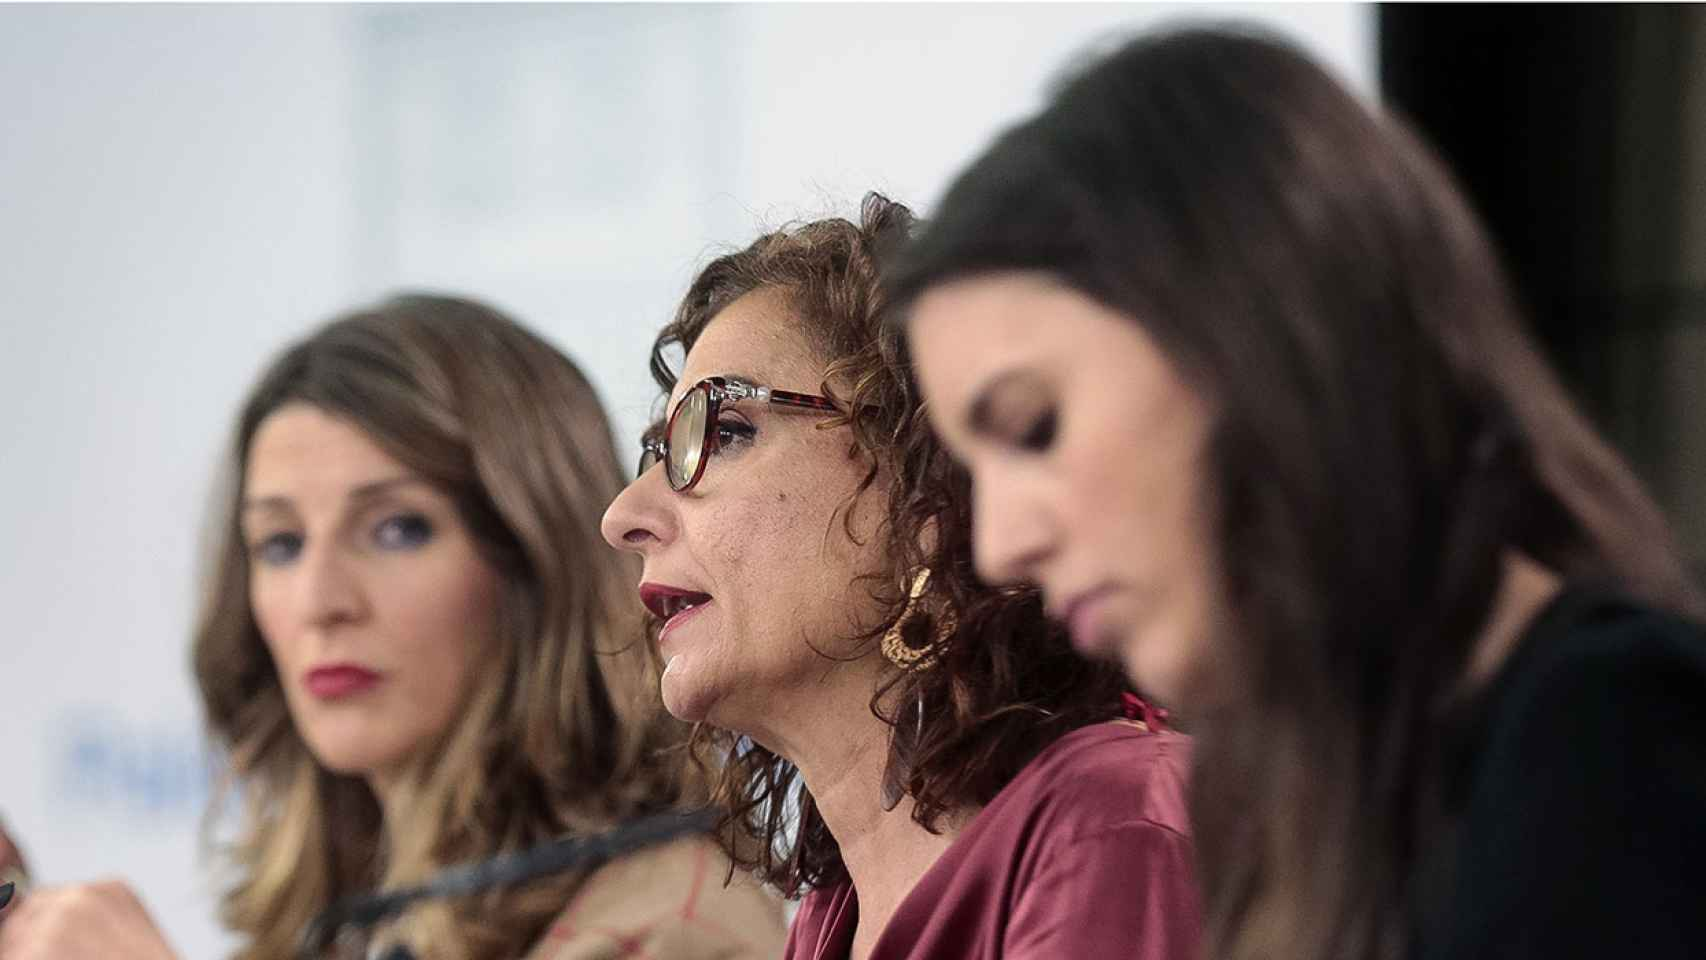 Las ministras María Jesús Montero, Yolanda Díaz e Irene Montero en la rueda de prensa del Consejo de Ministros.